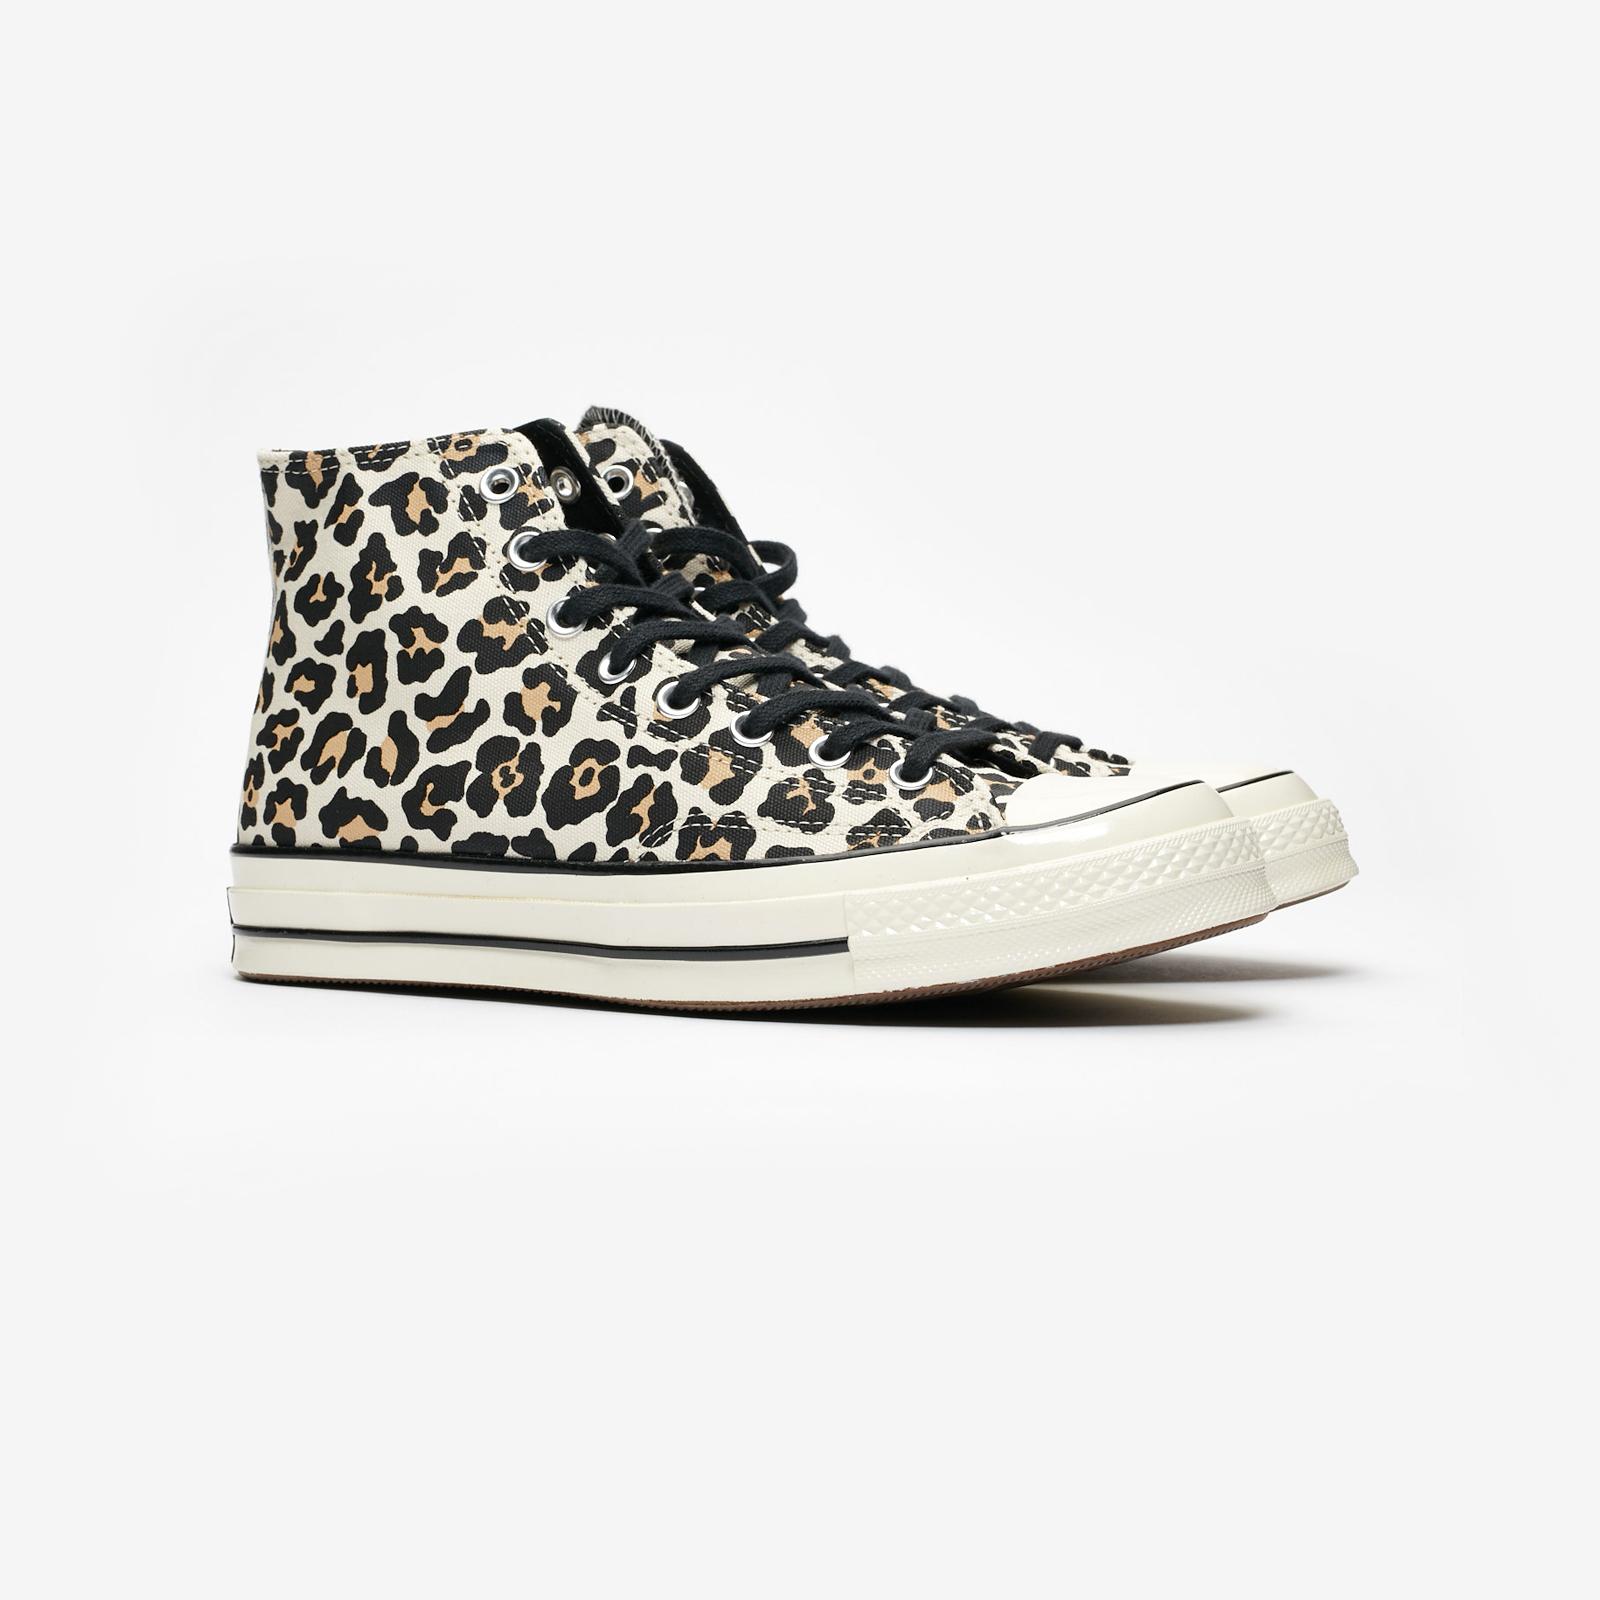 Converse Chuck 70 Hi 163406c Sneakersnstuff joggesko  sneakers